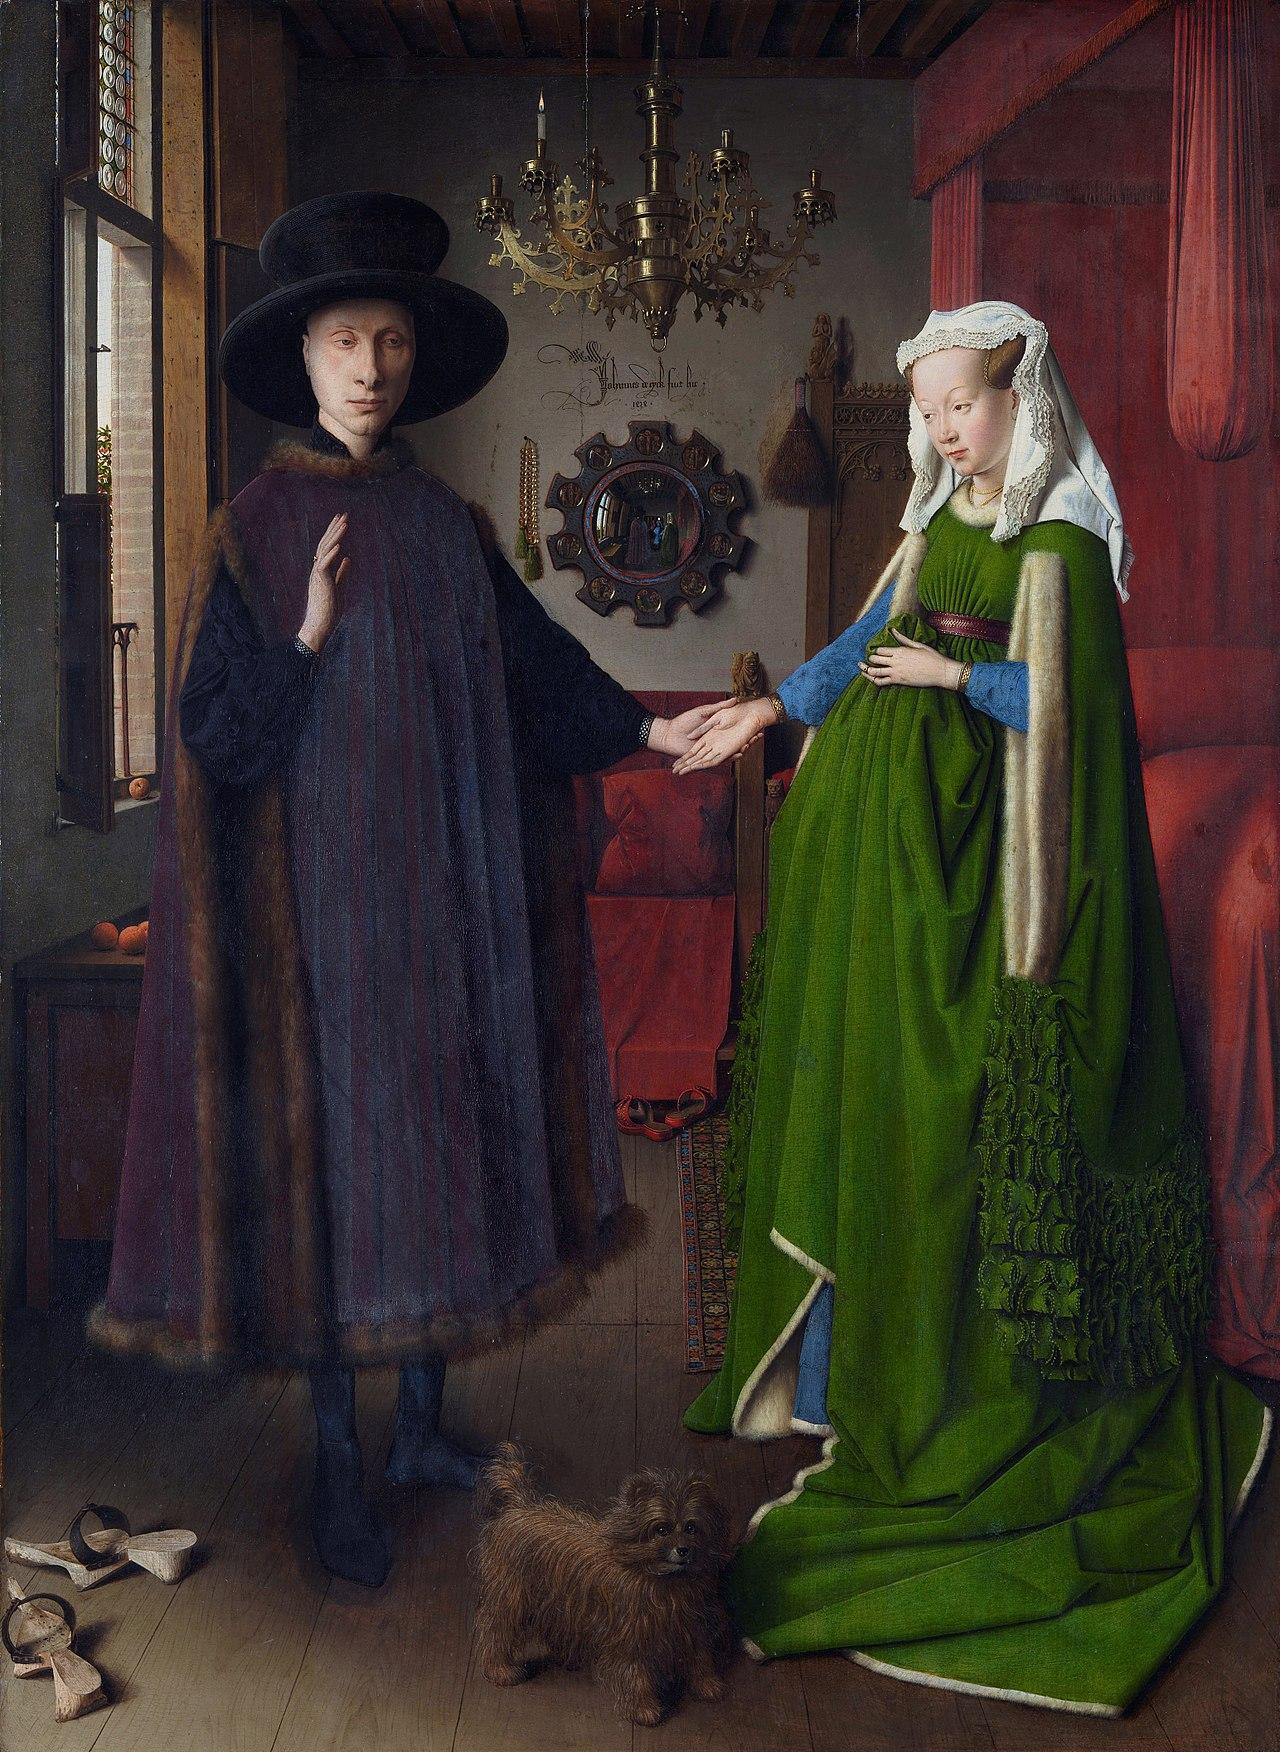 27. Ritratto dei coniugi Arnolfini - Jan van Eyck (1434) – National Gallery, Londra